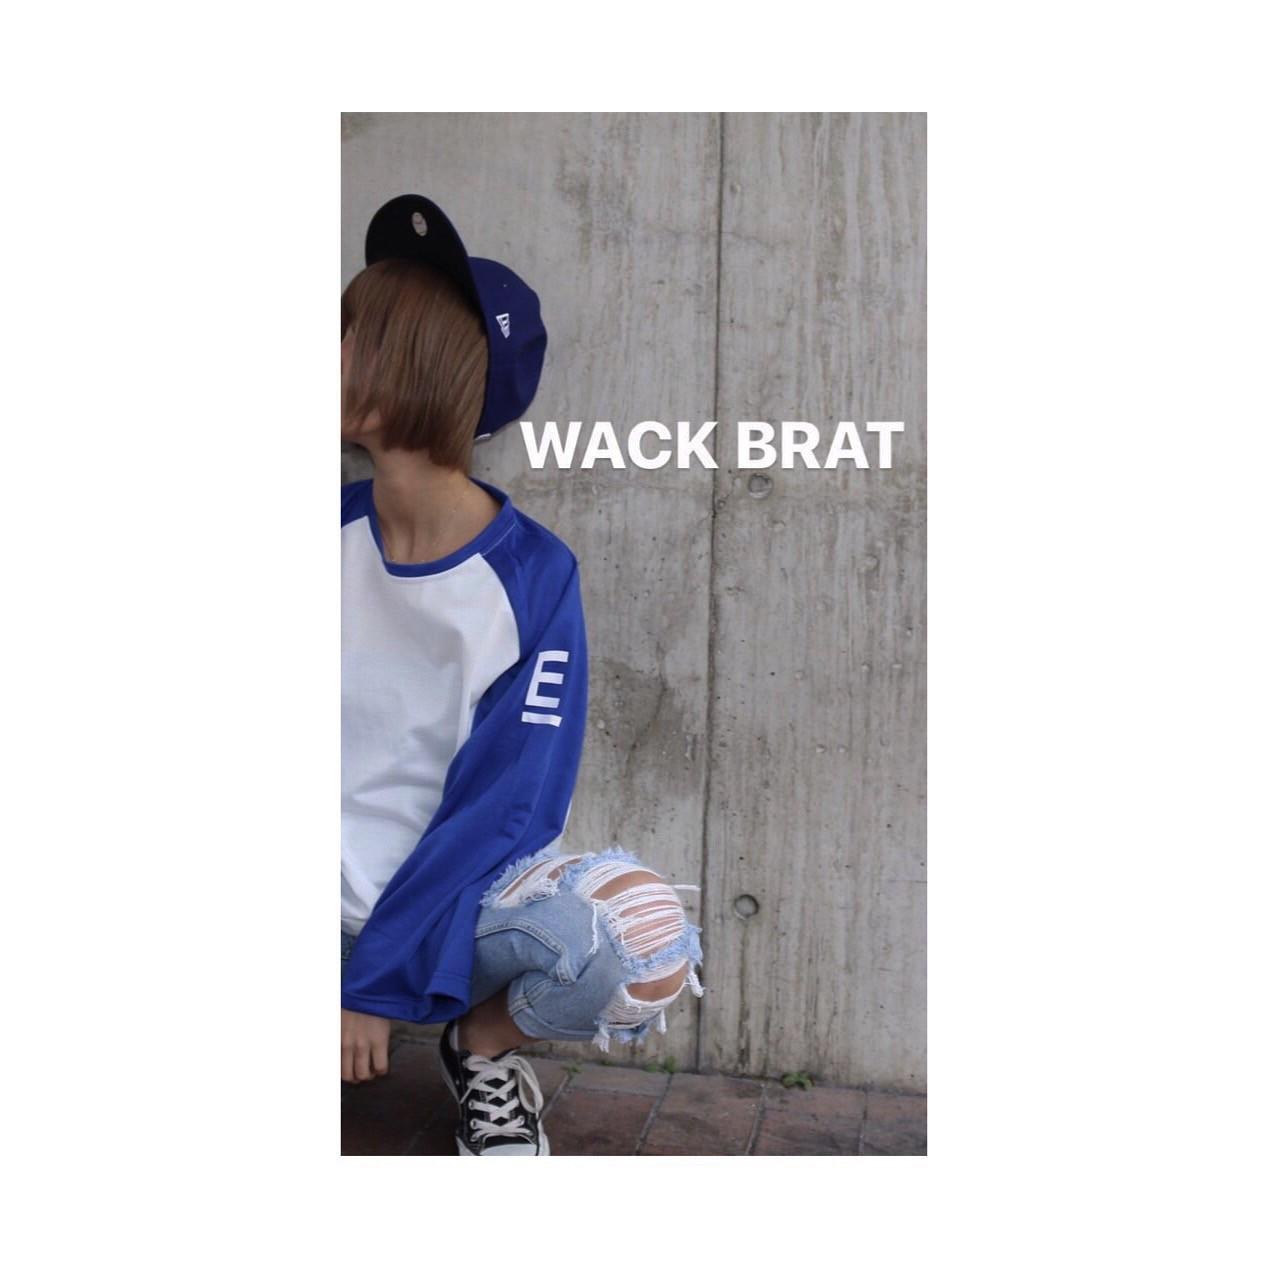 WACK BRAT